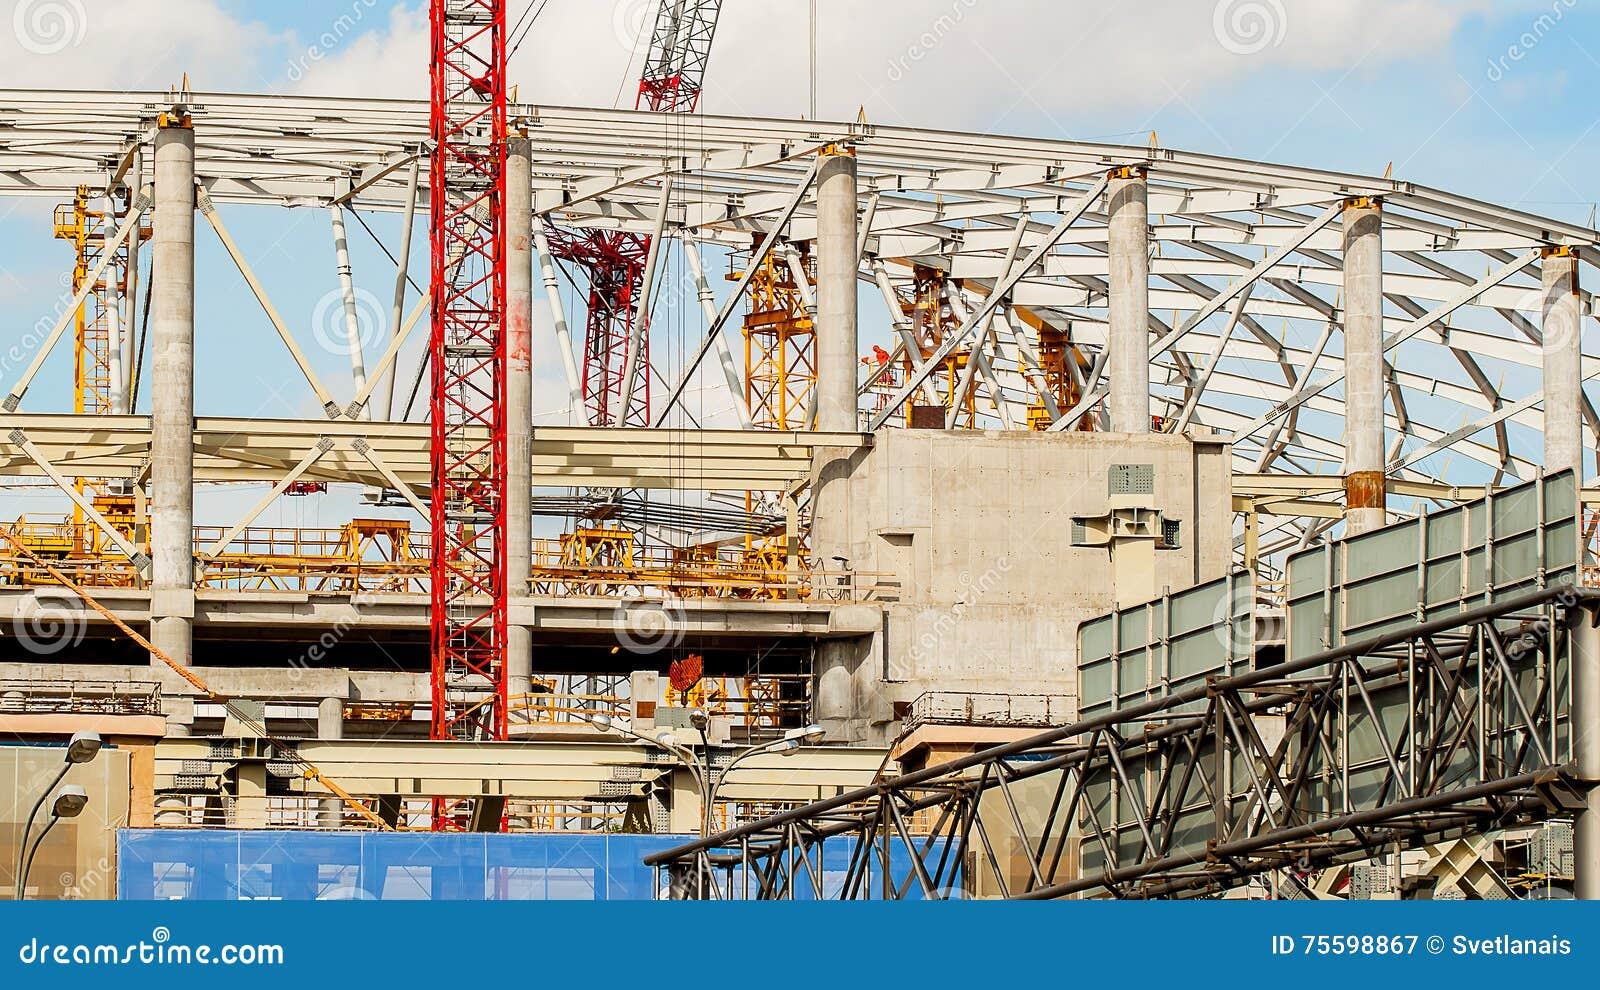 stade de football de chantier grues, crochet, bride de câble